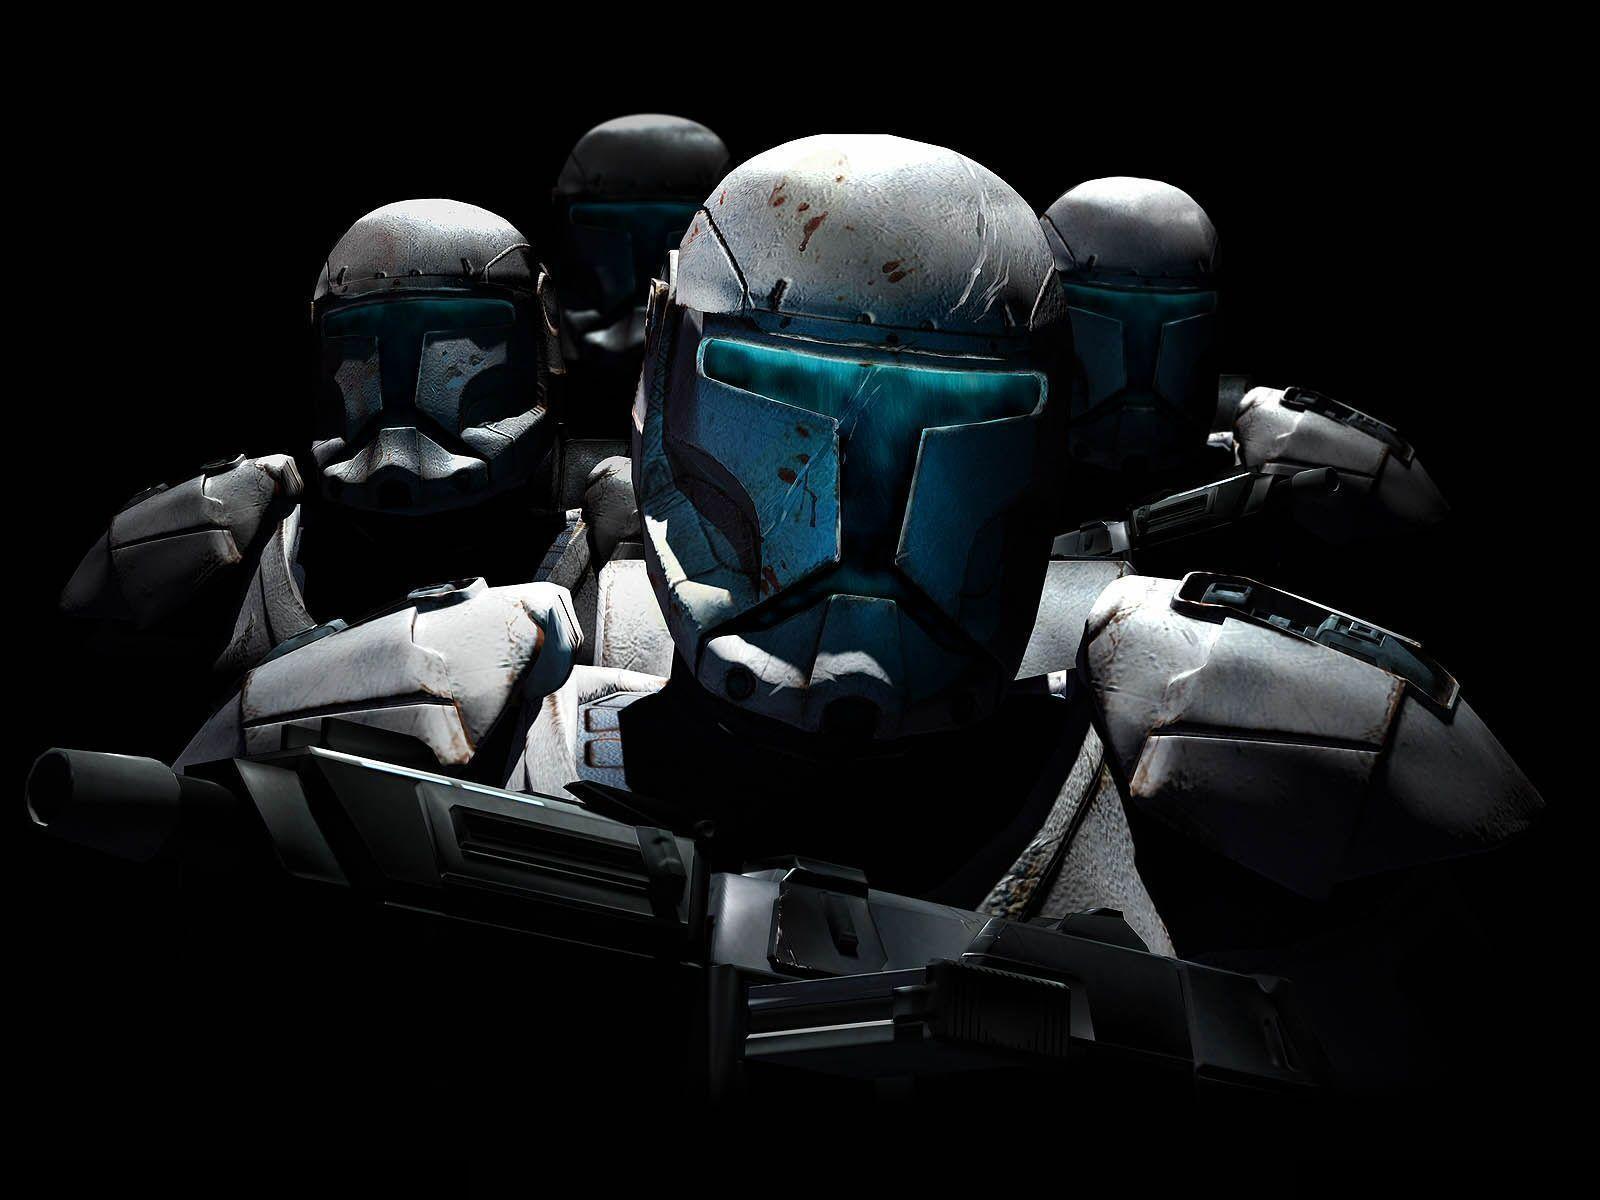 75 Star Wars Clone Wars Wallpaper On Wallpapersafari